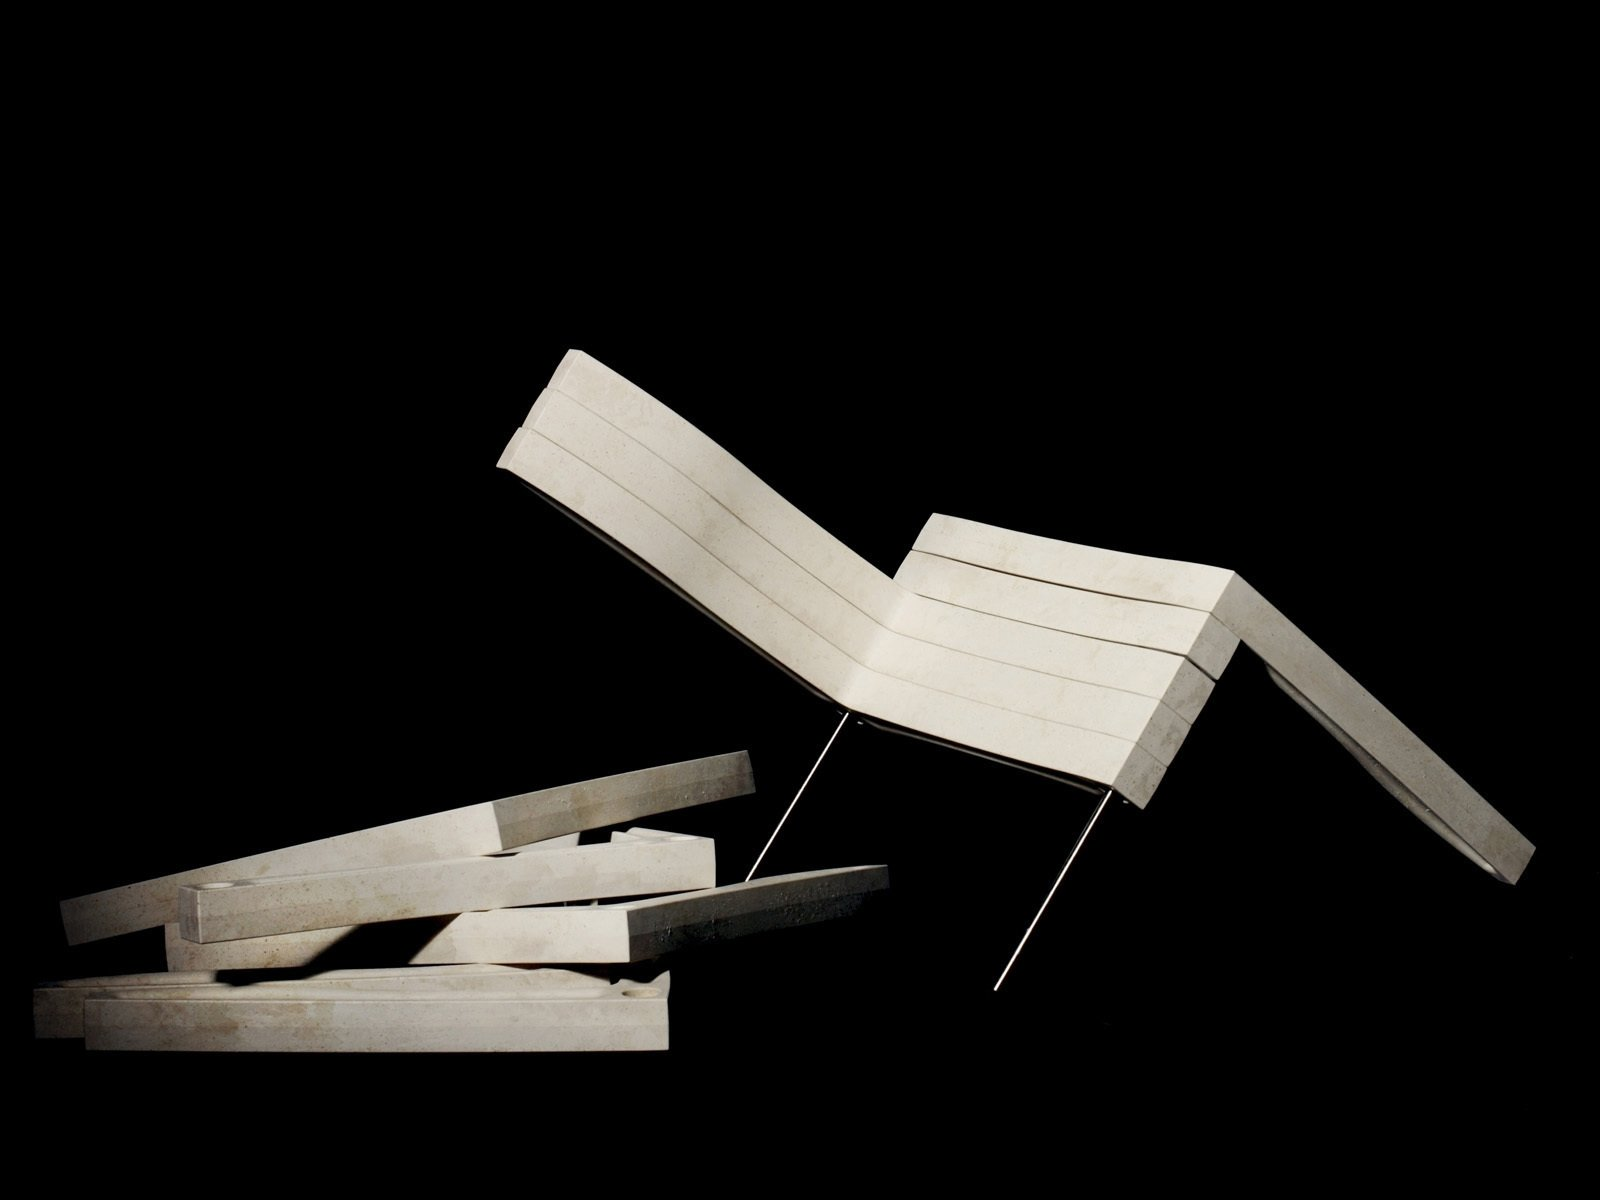 Artek, 10 Unit System, Designer Shigeru Ban  Photo 4 of 4 in From Milan: Q&A with Shigeru Ban